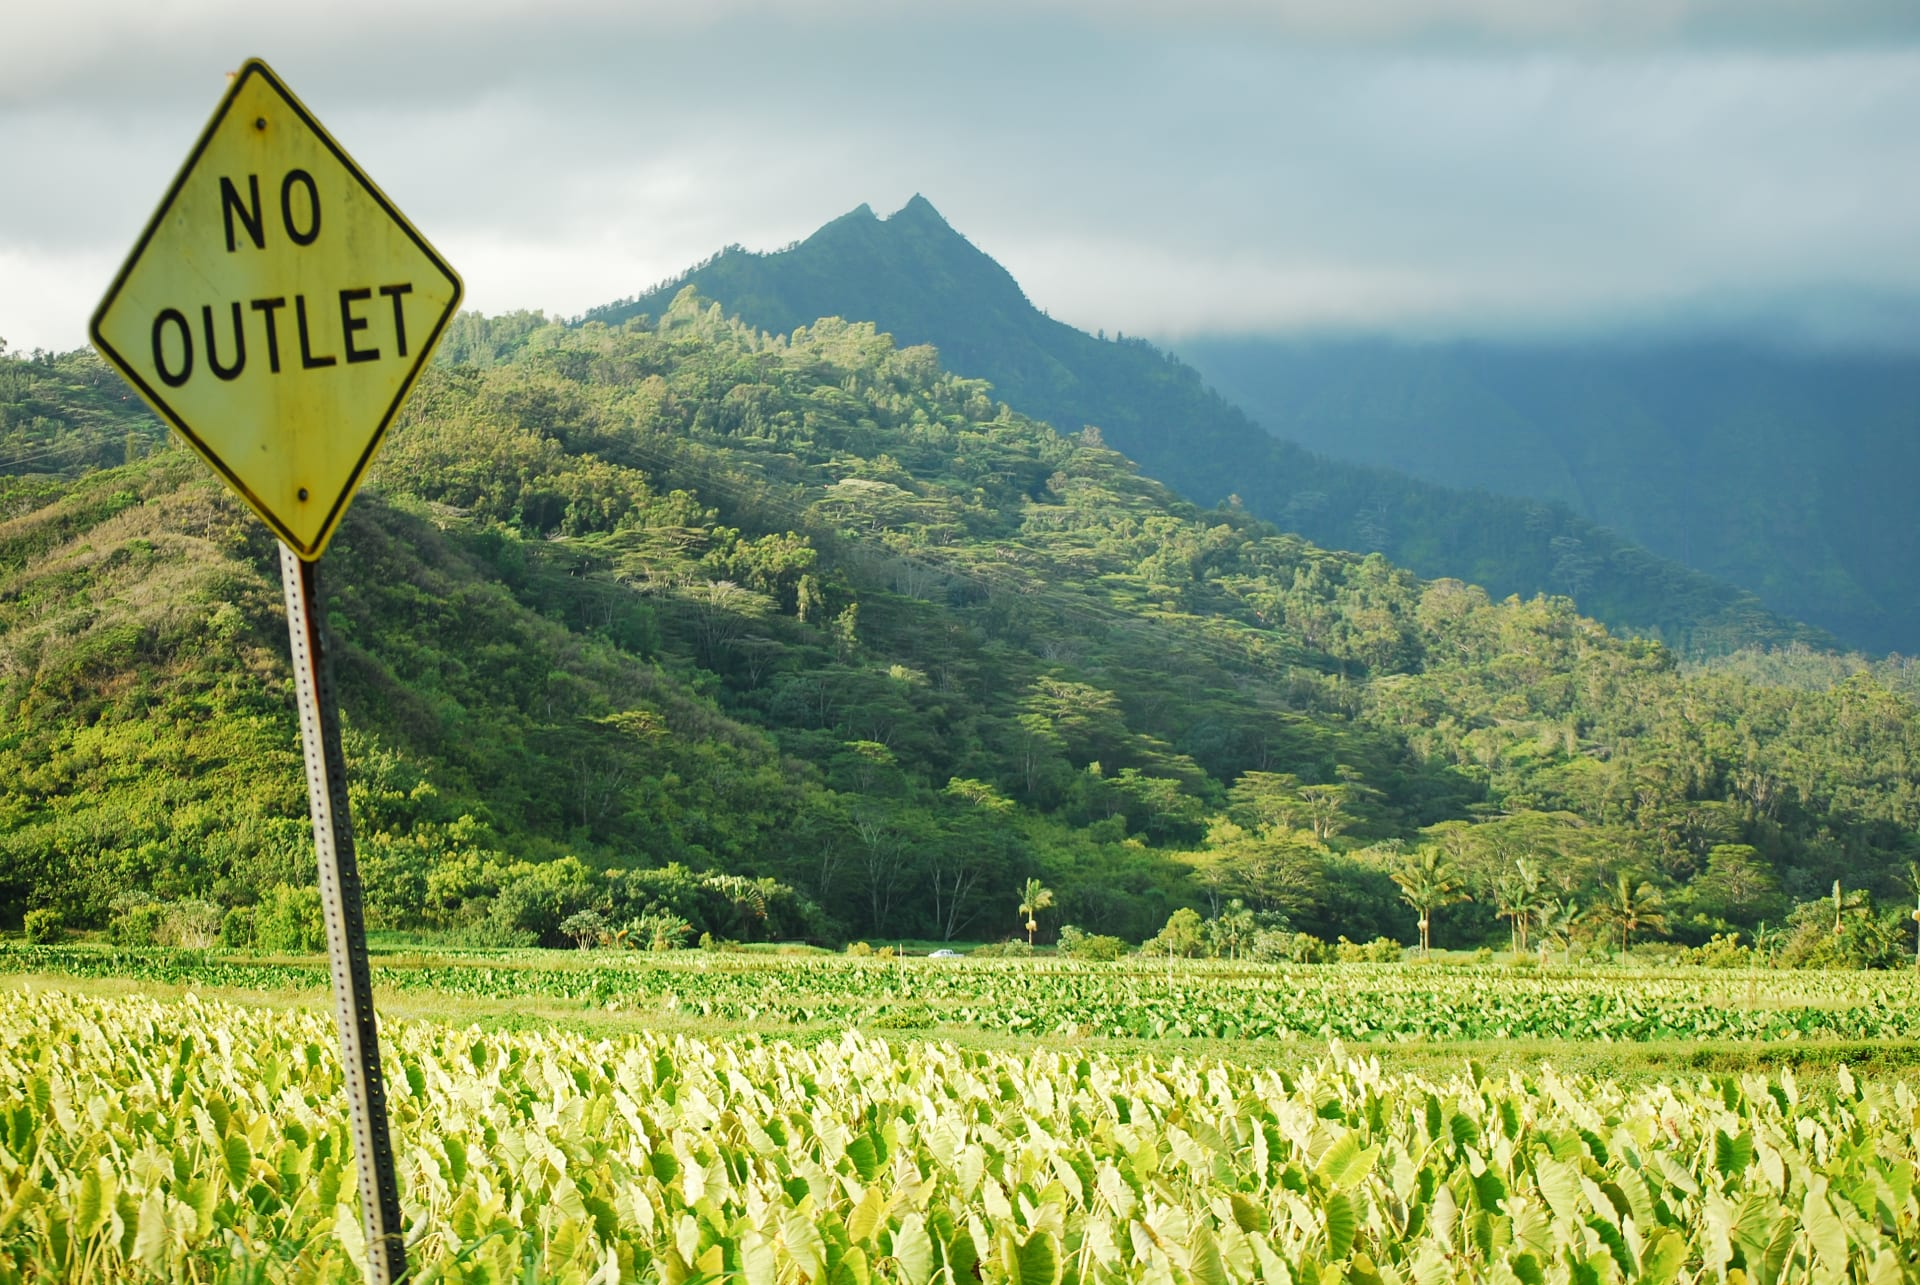 Princeville to Hanalei: Single-lane Traffic All January